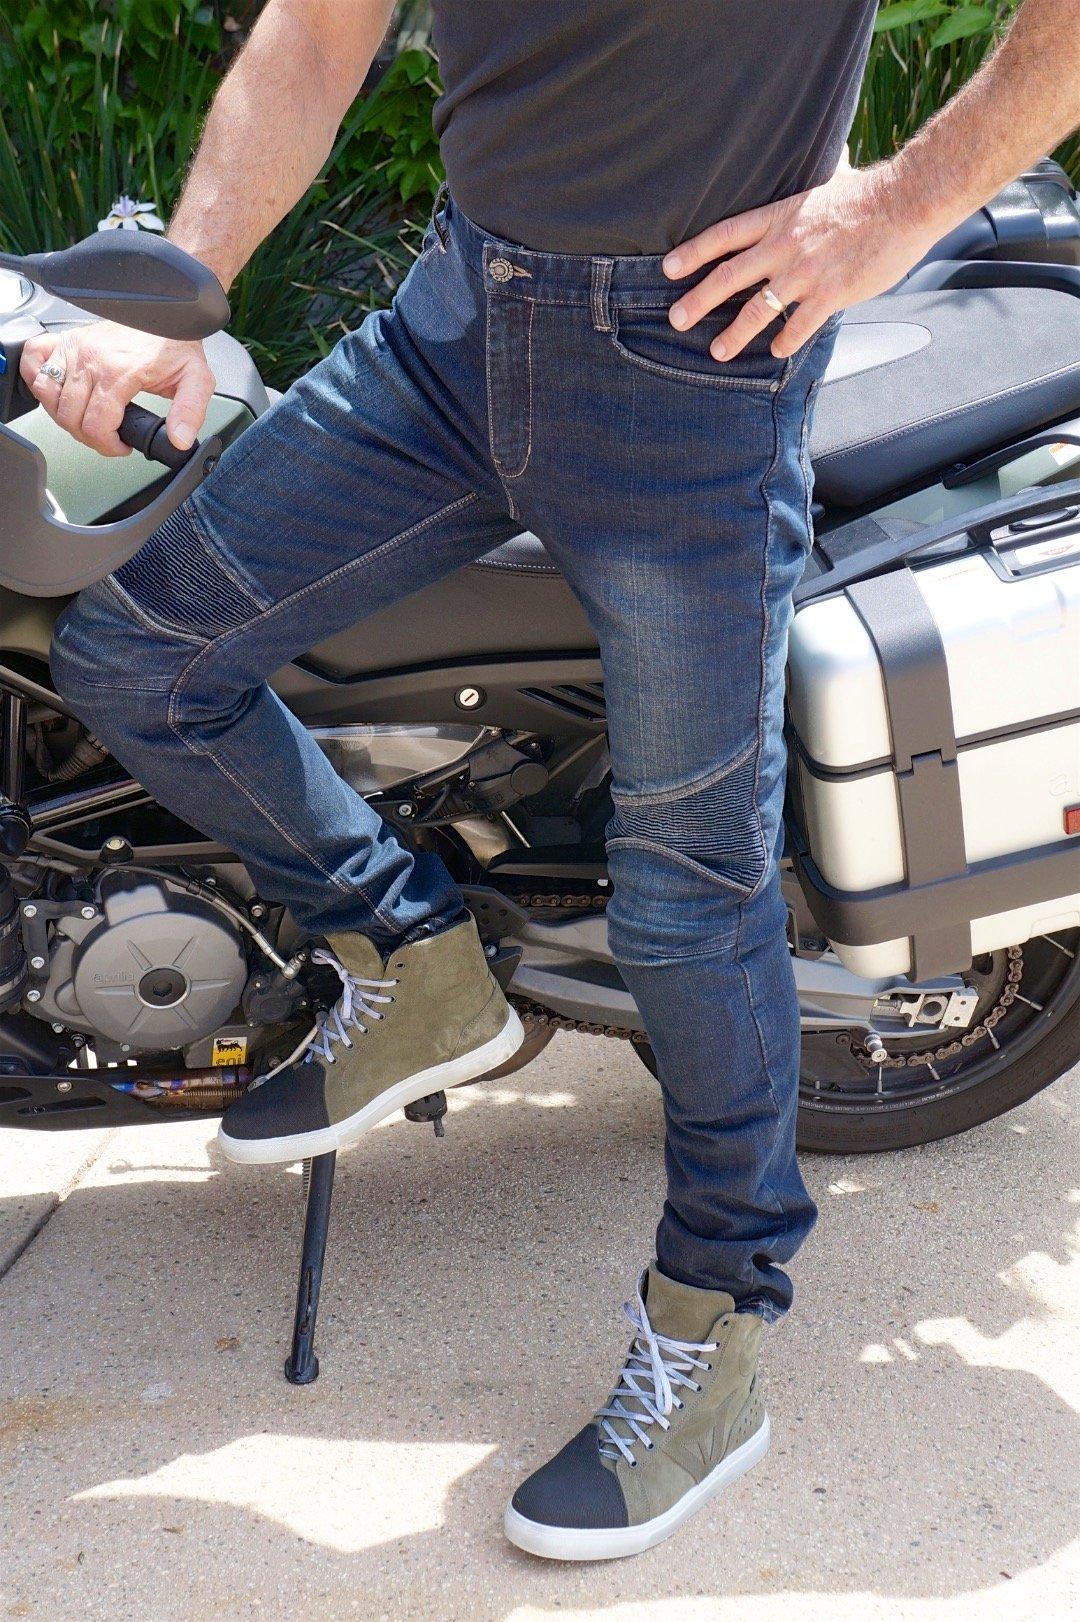 UglyBros 2Slub-K Jeans Review | Stretchy Protection